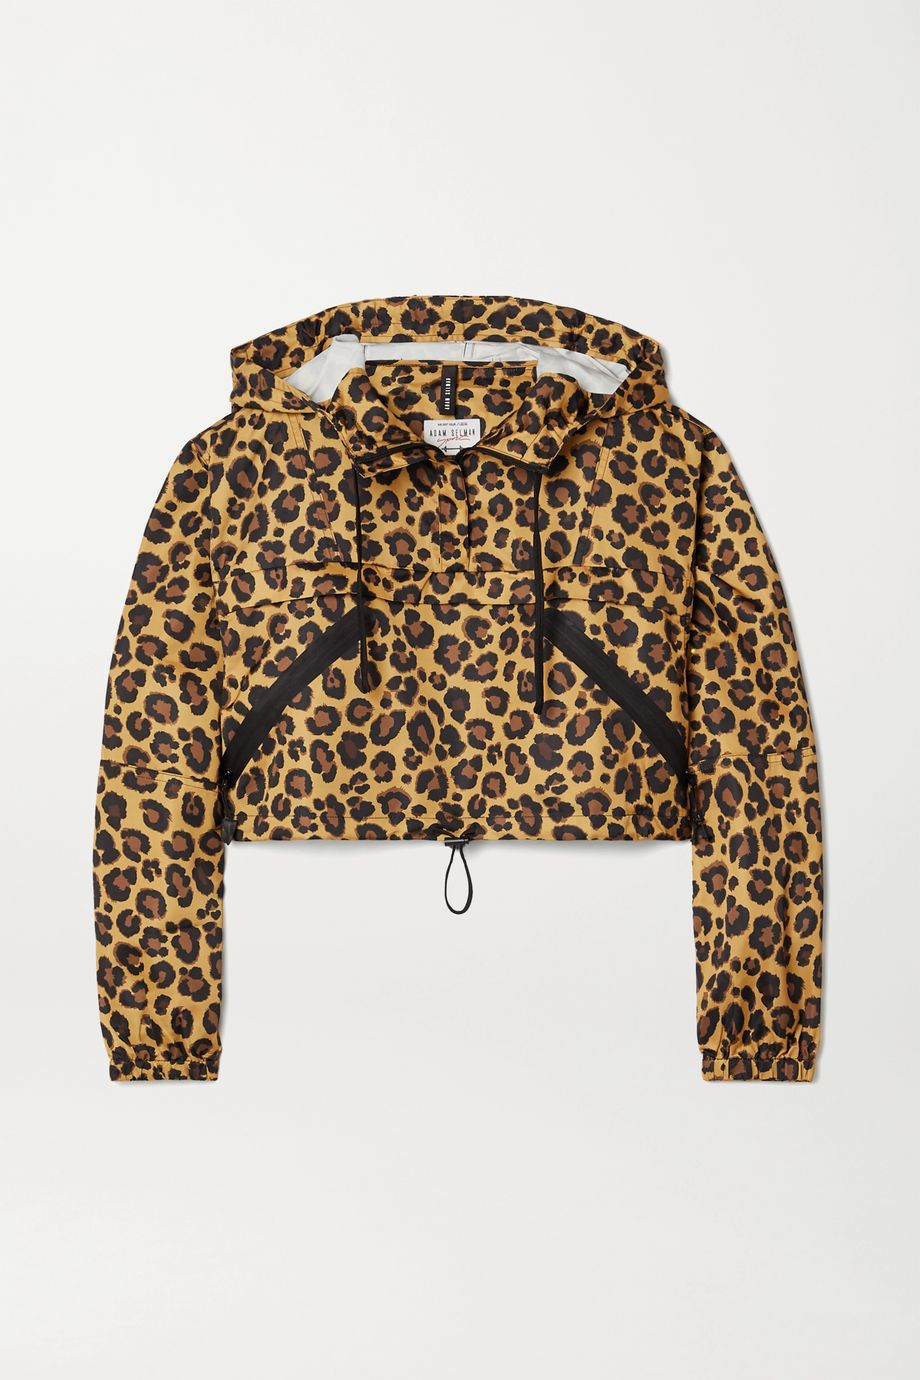 Adam Selman Sport Verkürzter Hoodie aus Shell mit Leopardenprint